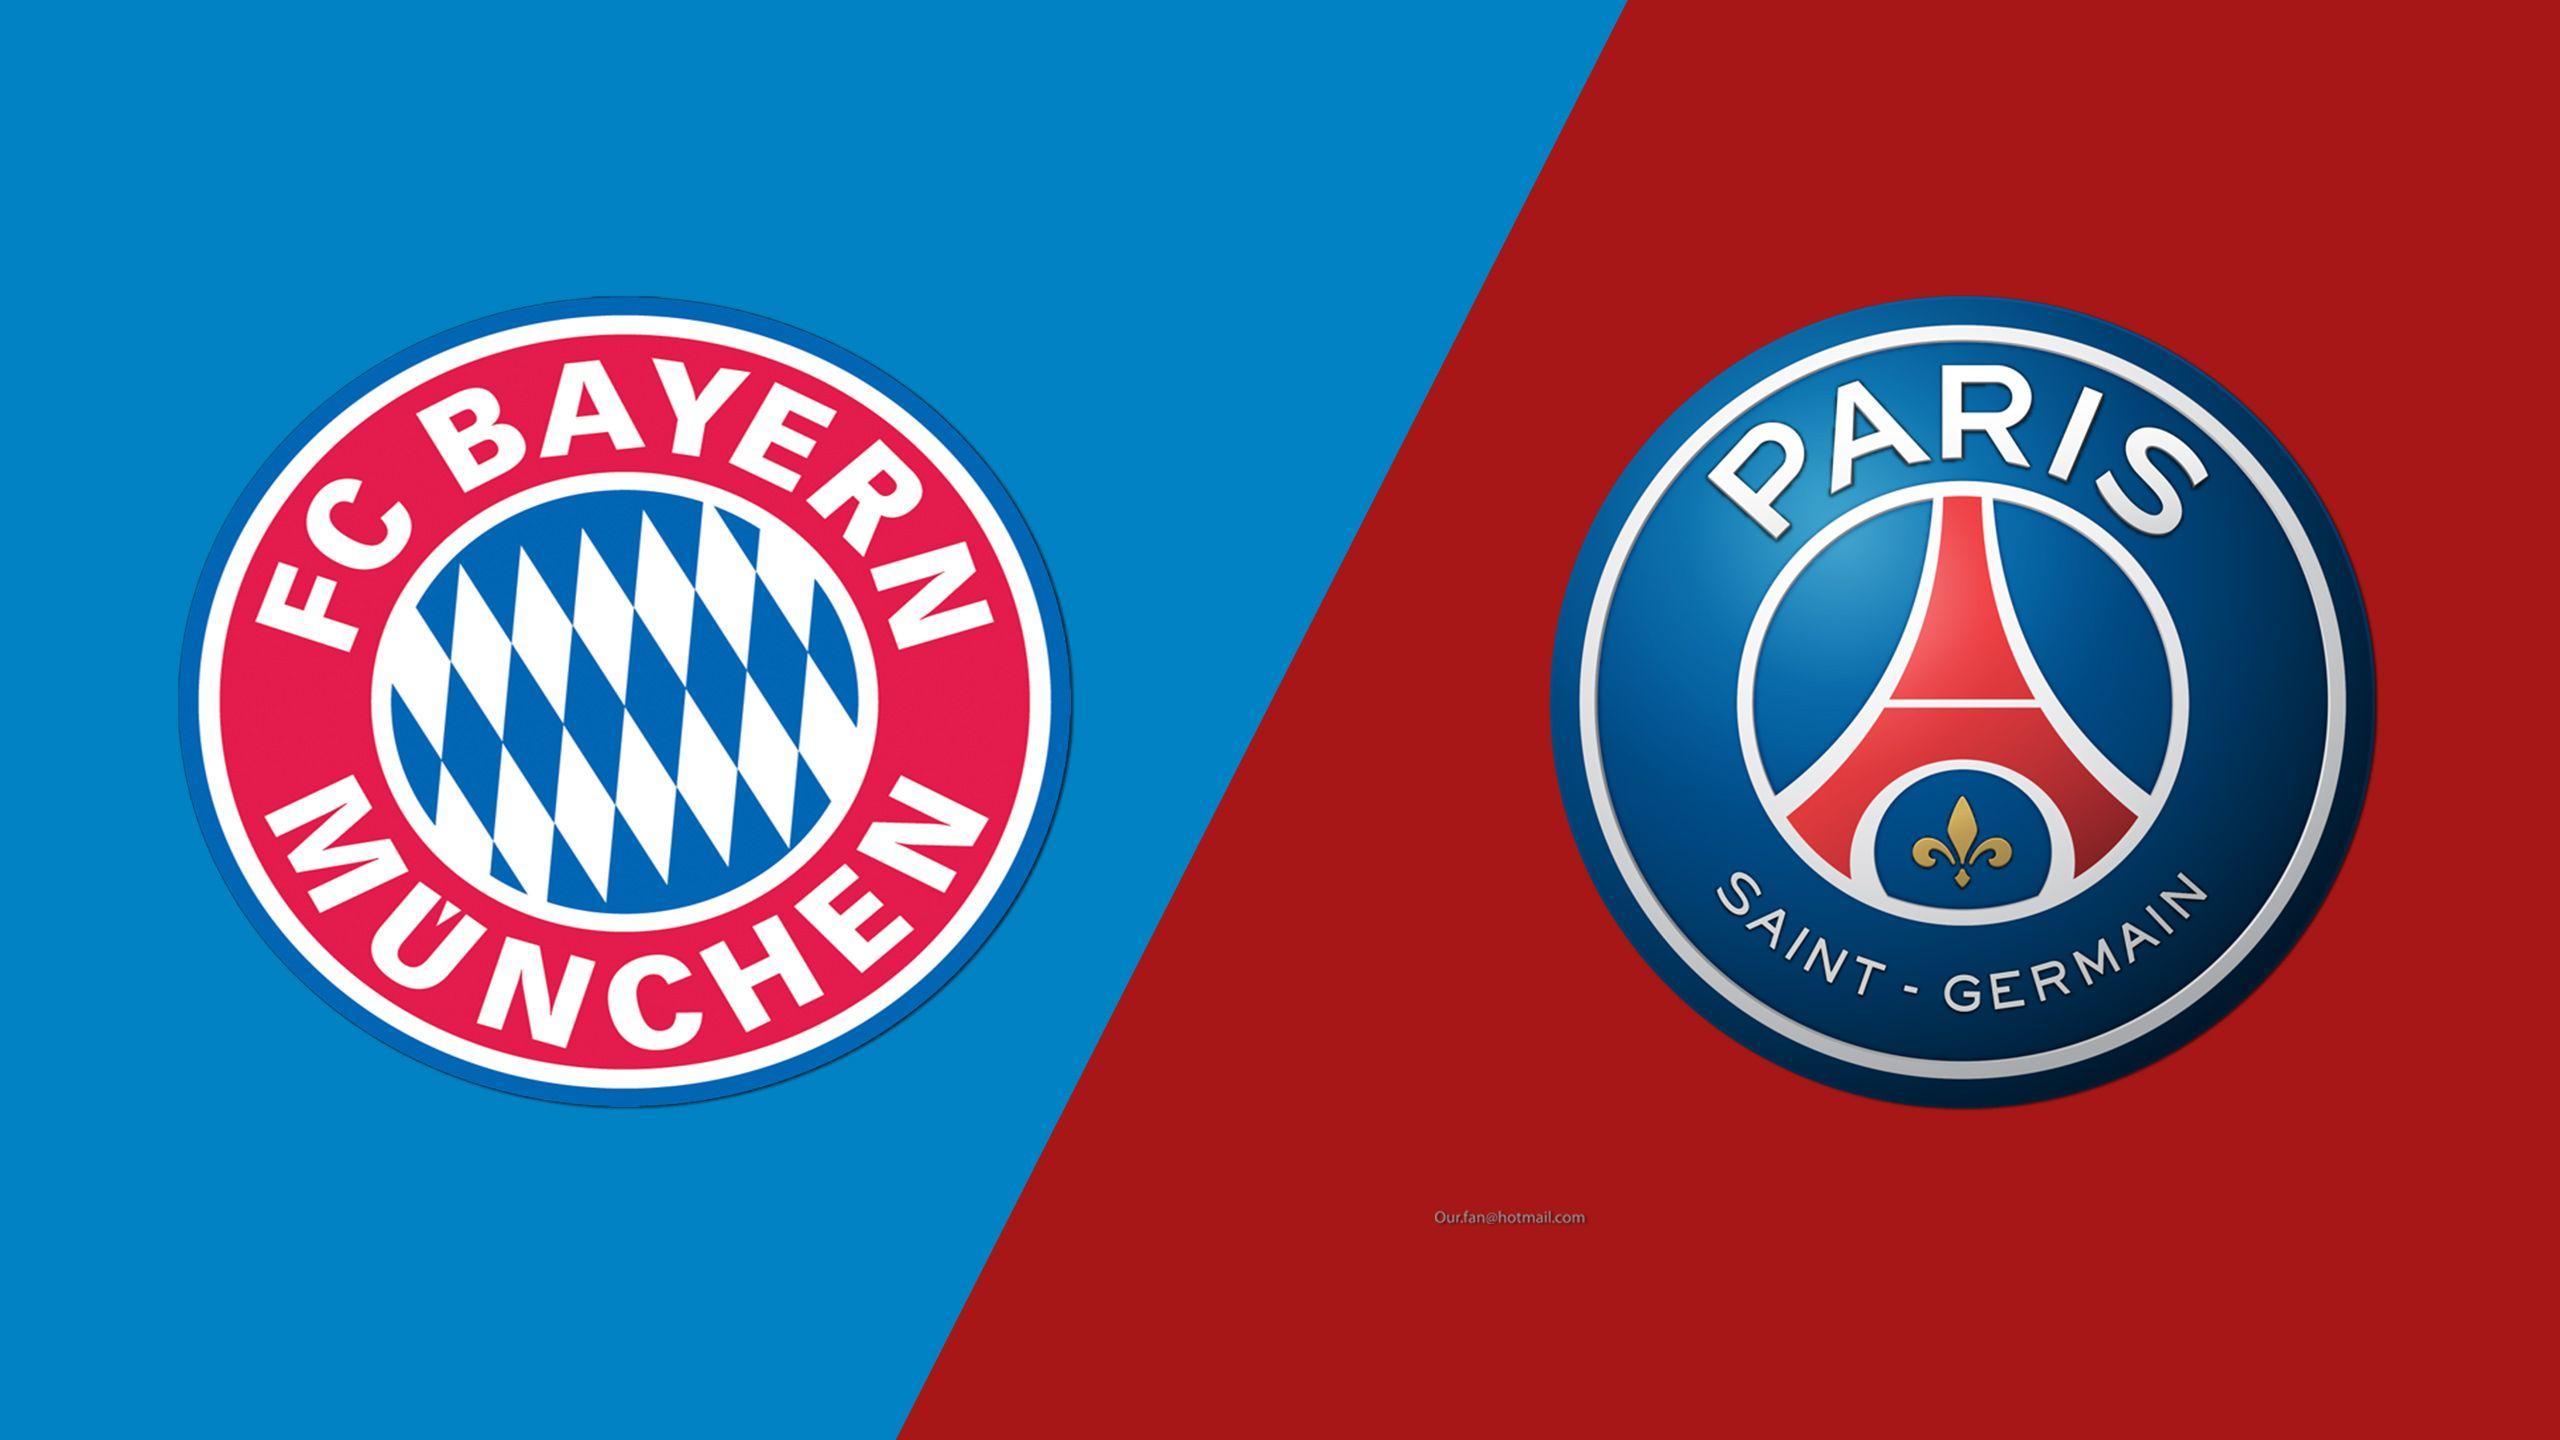 In Spanish - Bayern Munich vs. Paris Saint Germain (International Champions Cup)